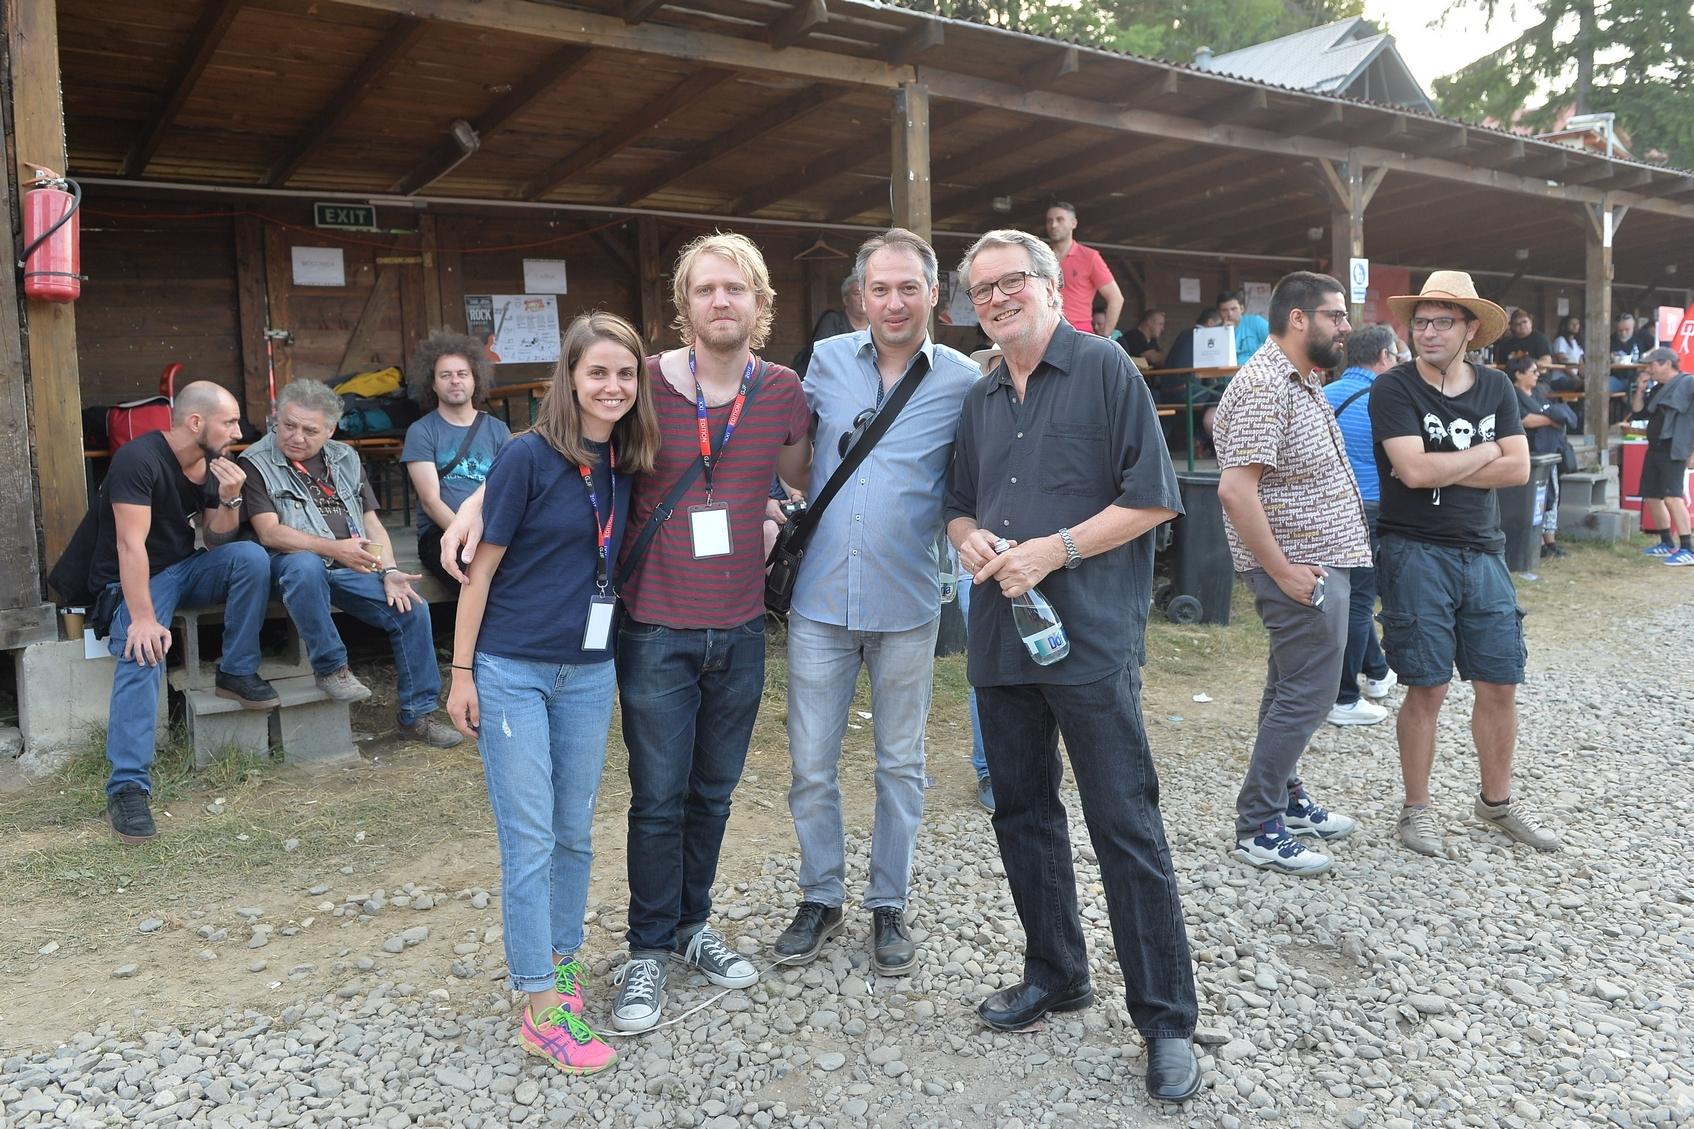 Simona Giura, Jon Falt, Nenad Georgievski and  Bobo Stenson in audience  at Garana Jazz Festival 2017